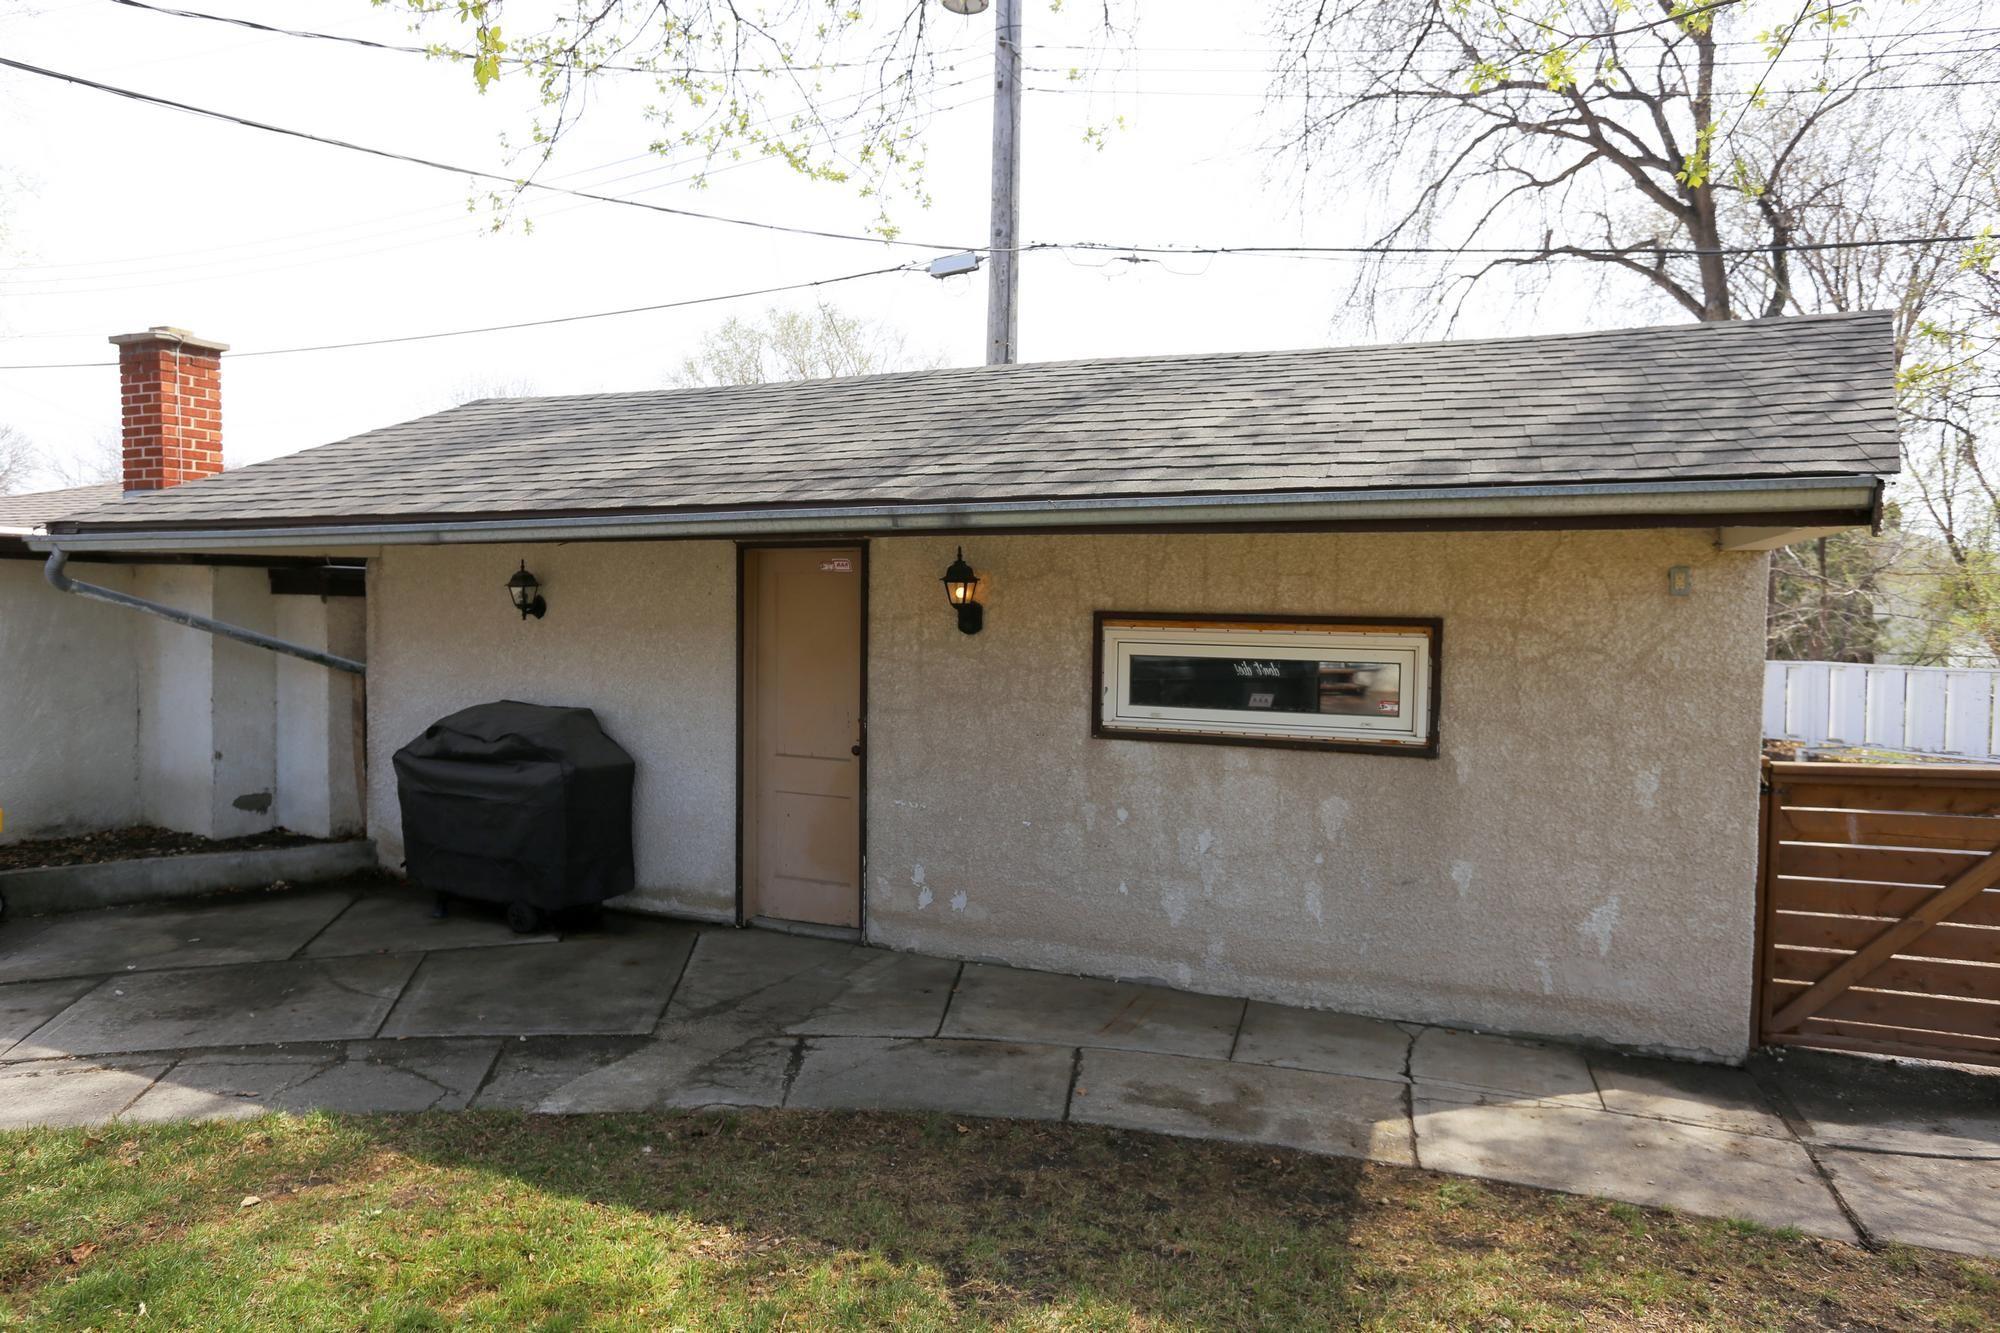 Photo 33: Photos: 1322 Valour Road in Winnipeg: Sargent Park Single Family Detached for sale (5C)  : MLS®# 1811835